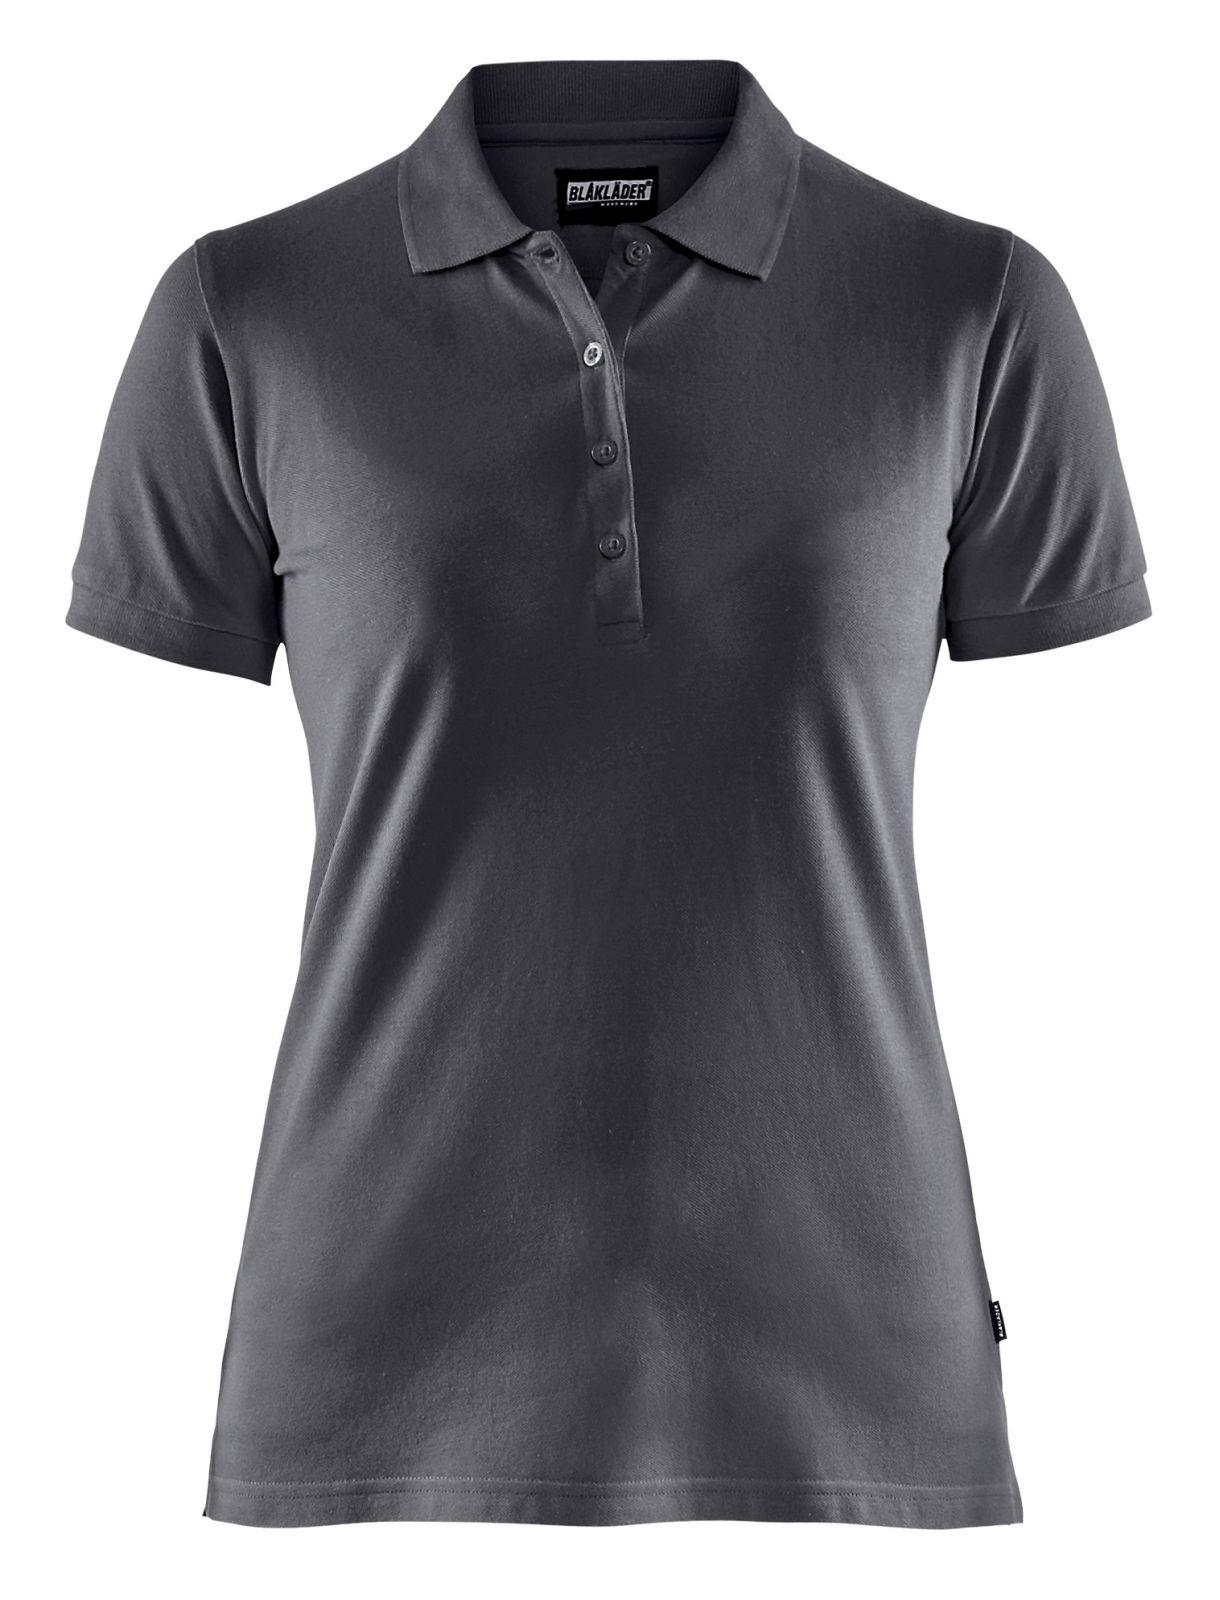 Blaklader Dames polo shirts 33071035 donkergrijs(9800)